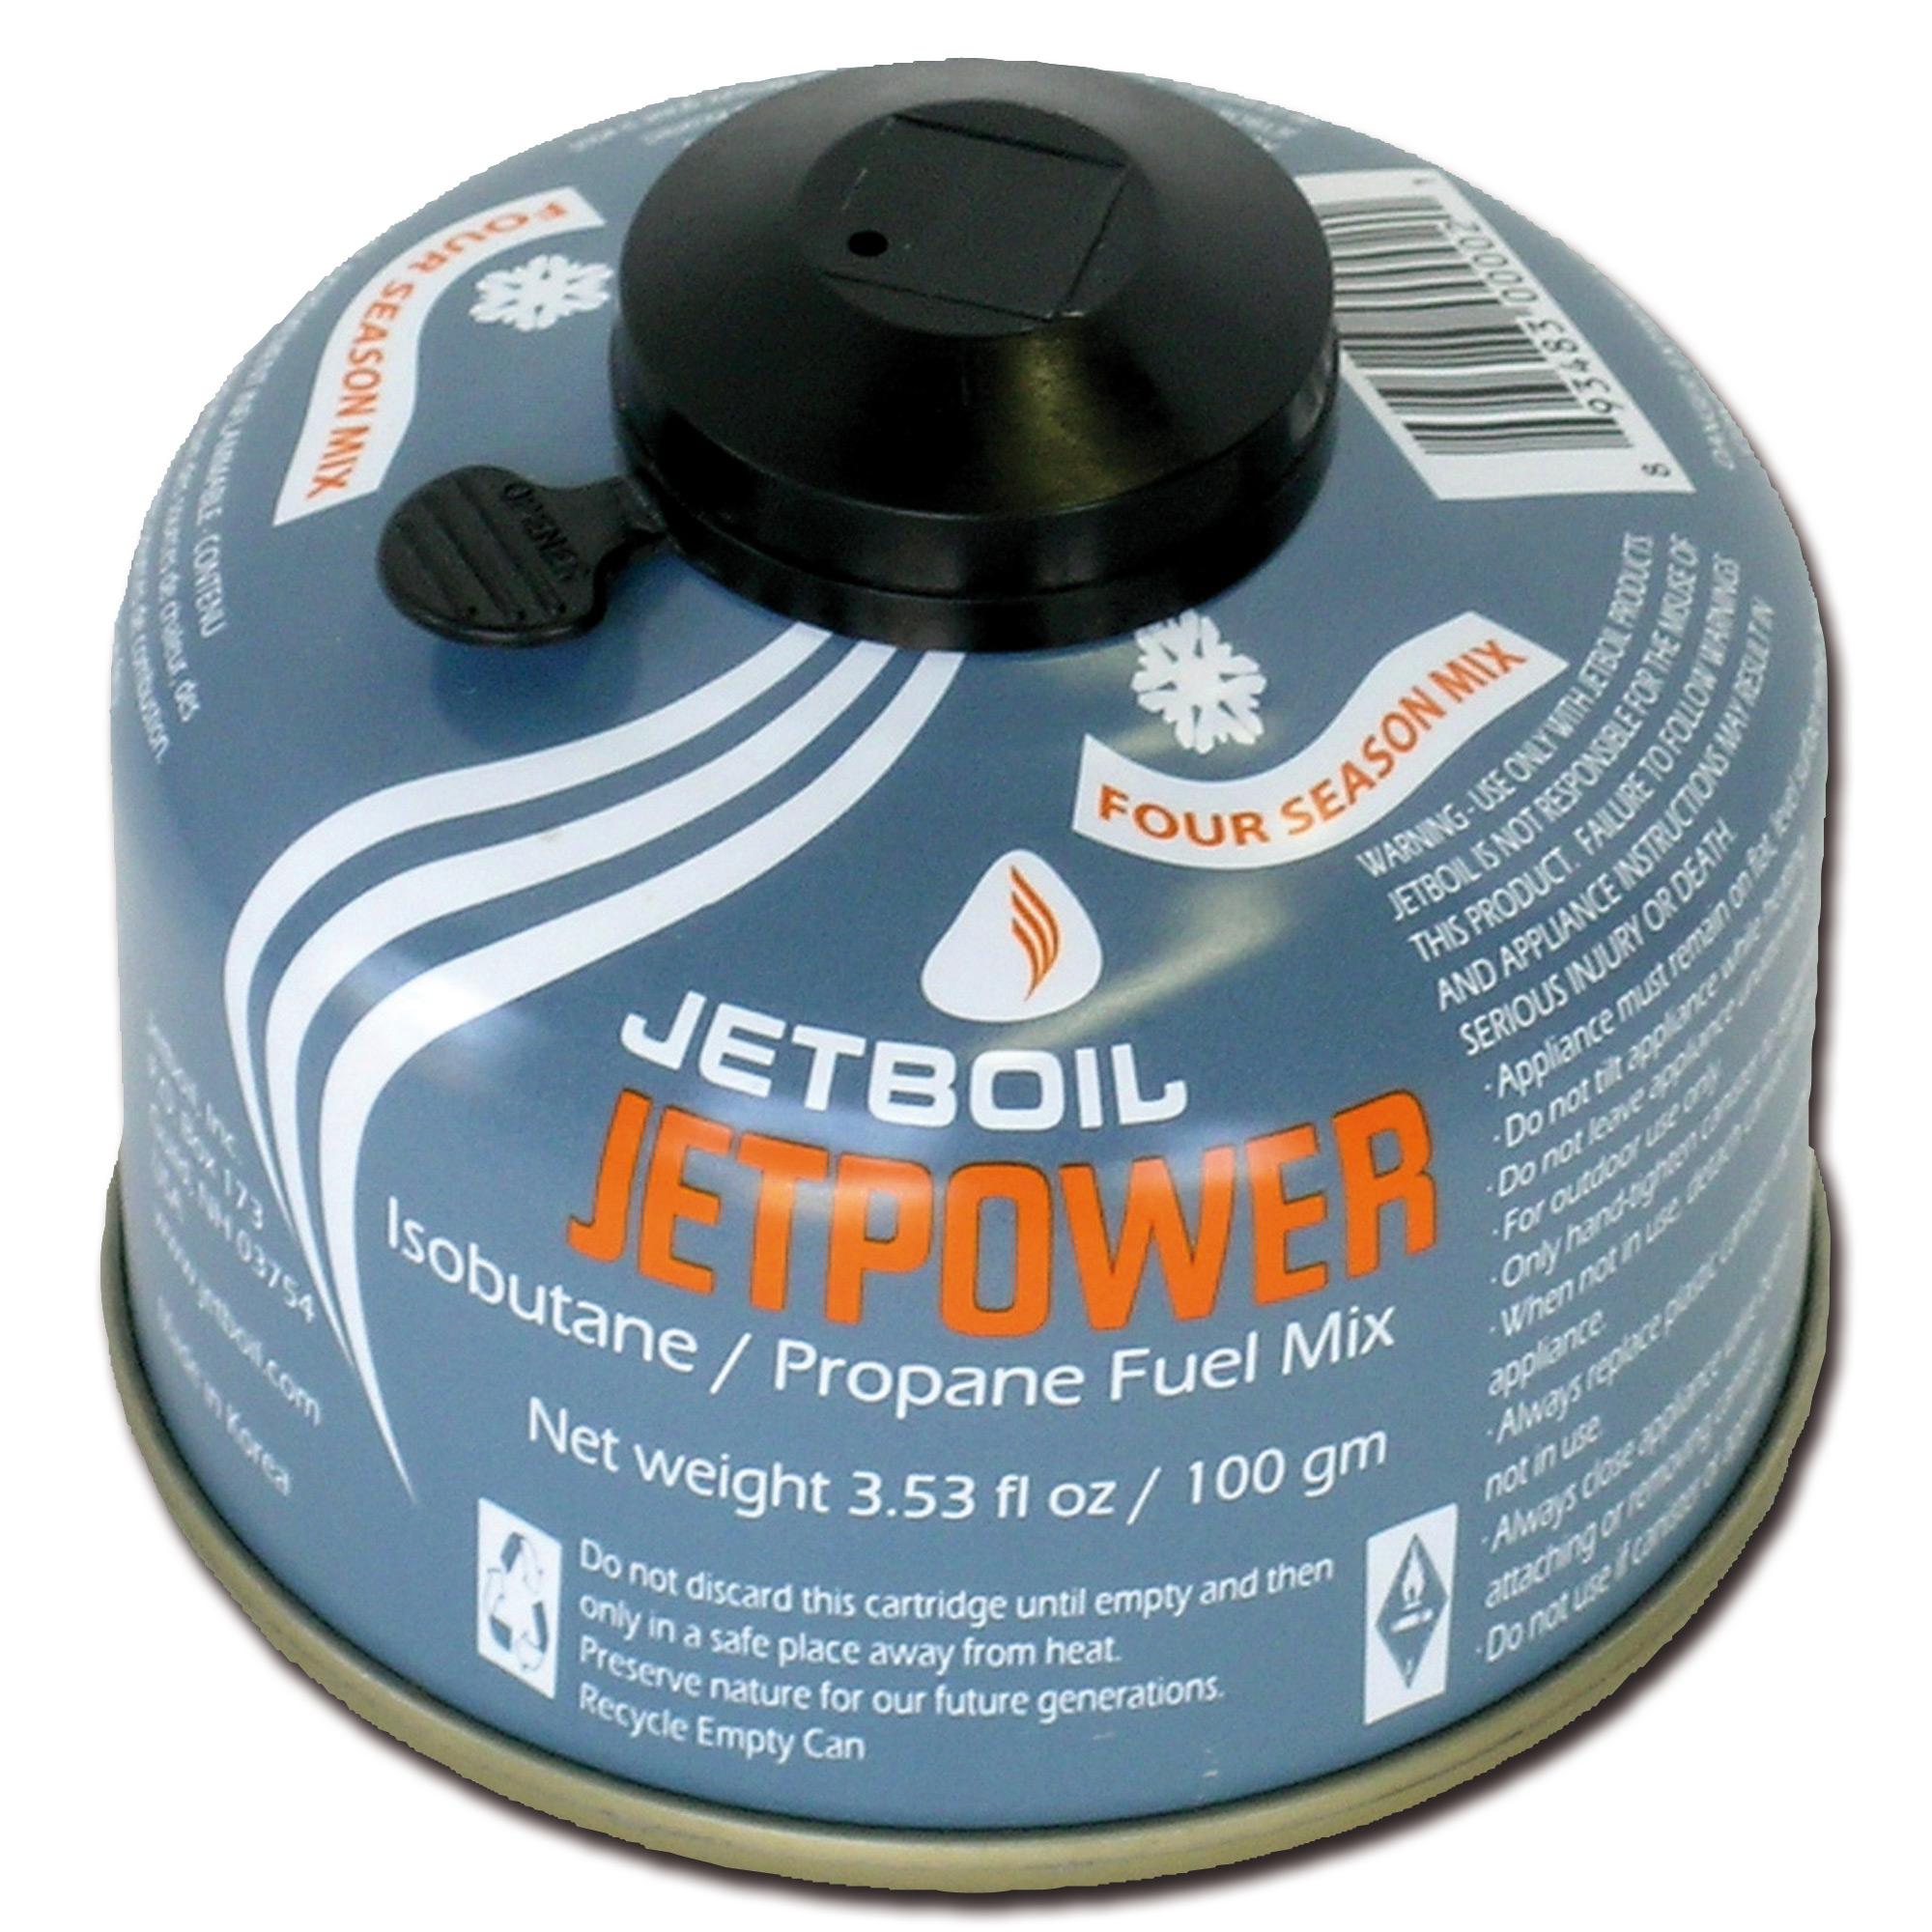 Jetboil Jetpower 100